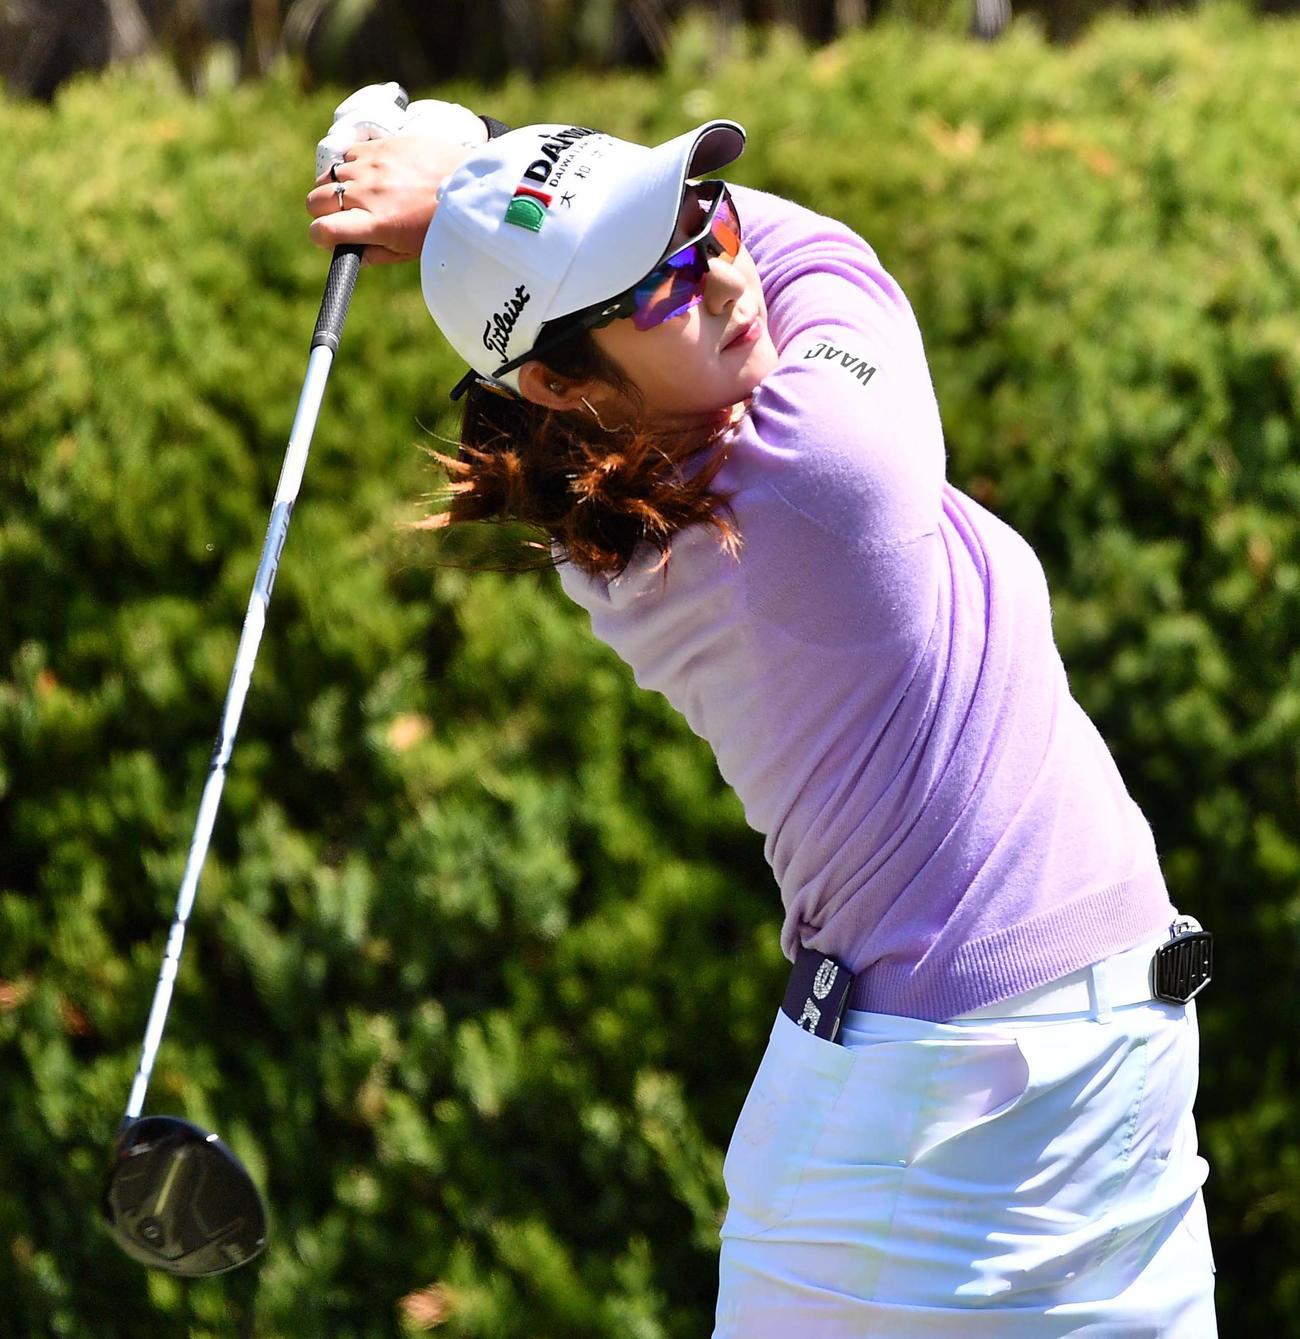 https://www.nikkansports.com/sports/golf/news/img/202104110000270-w1300_7.jpg